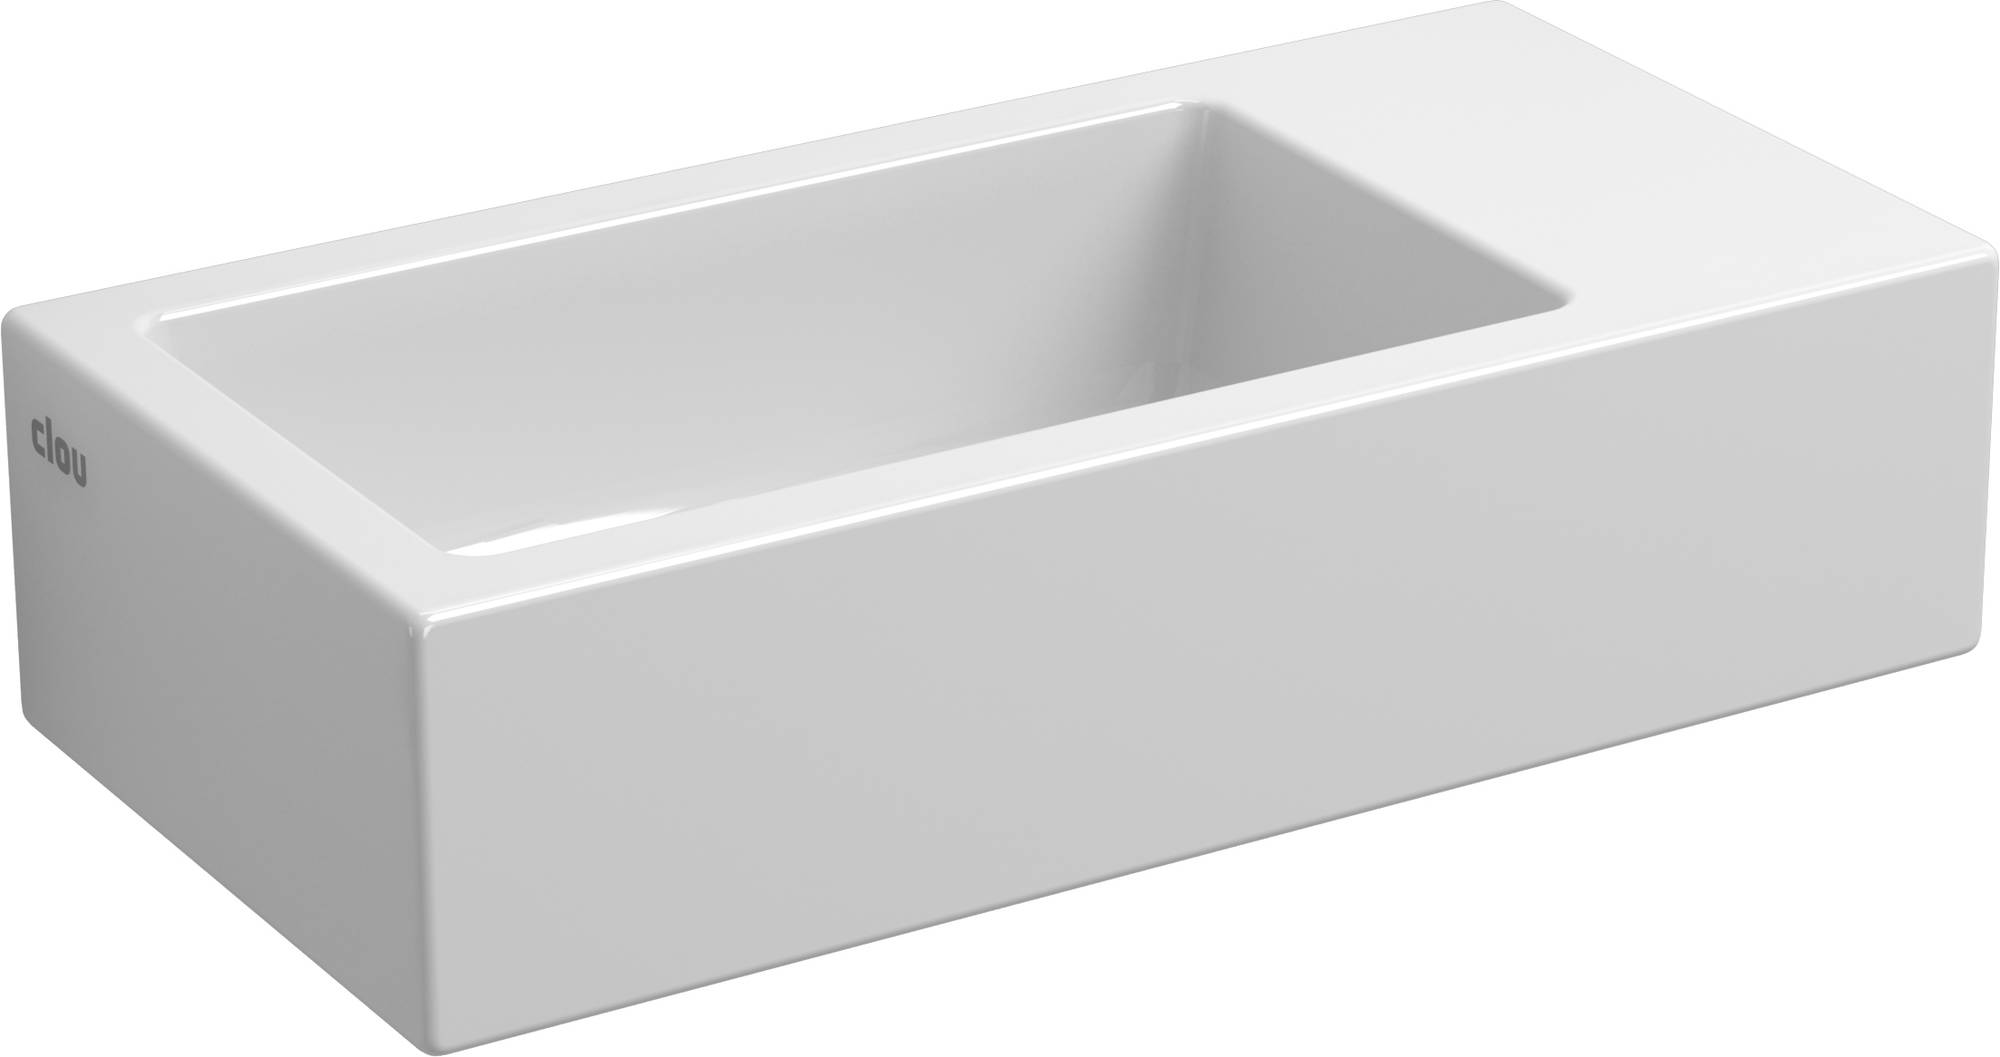 Clou Flush fontein (flush 3) zonder kraangat rechts met plug wit keramiek